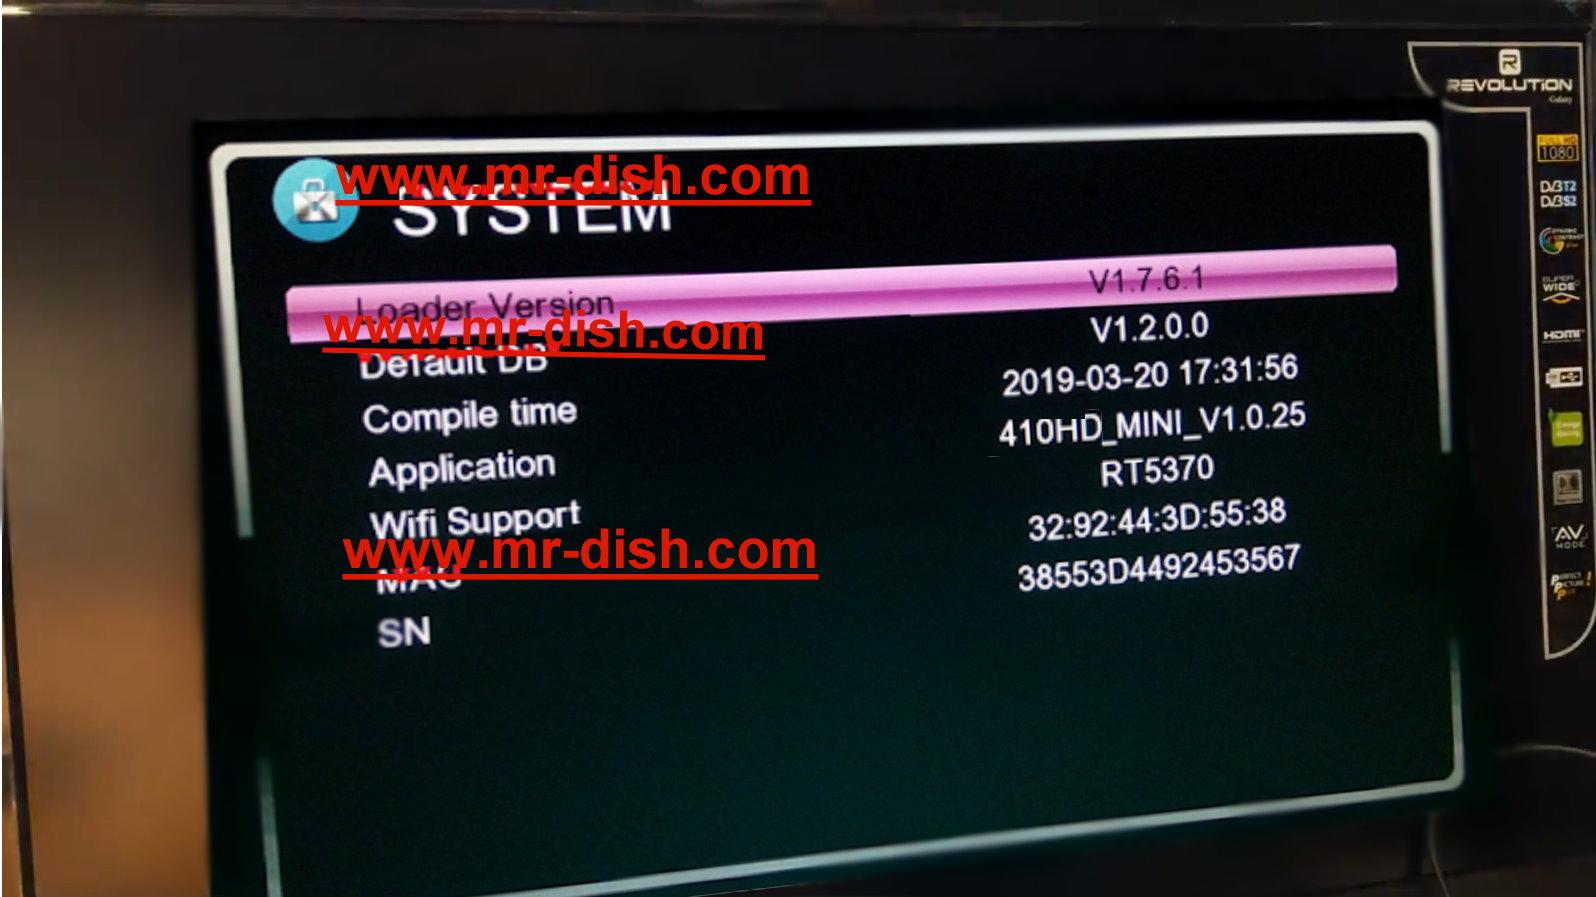 DREAMSAT 410 HD MINI RECEIVER LATEST POWERVU SOFTWARE